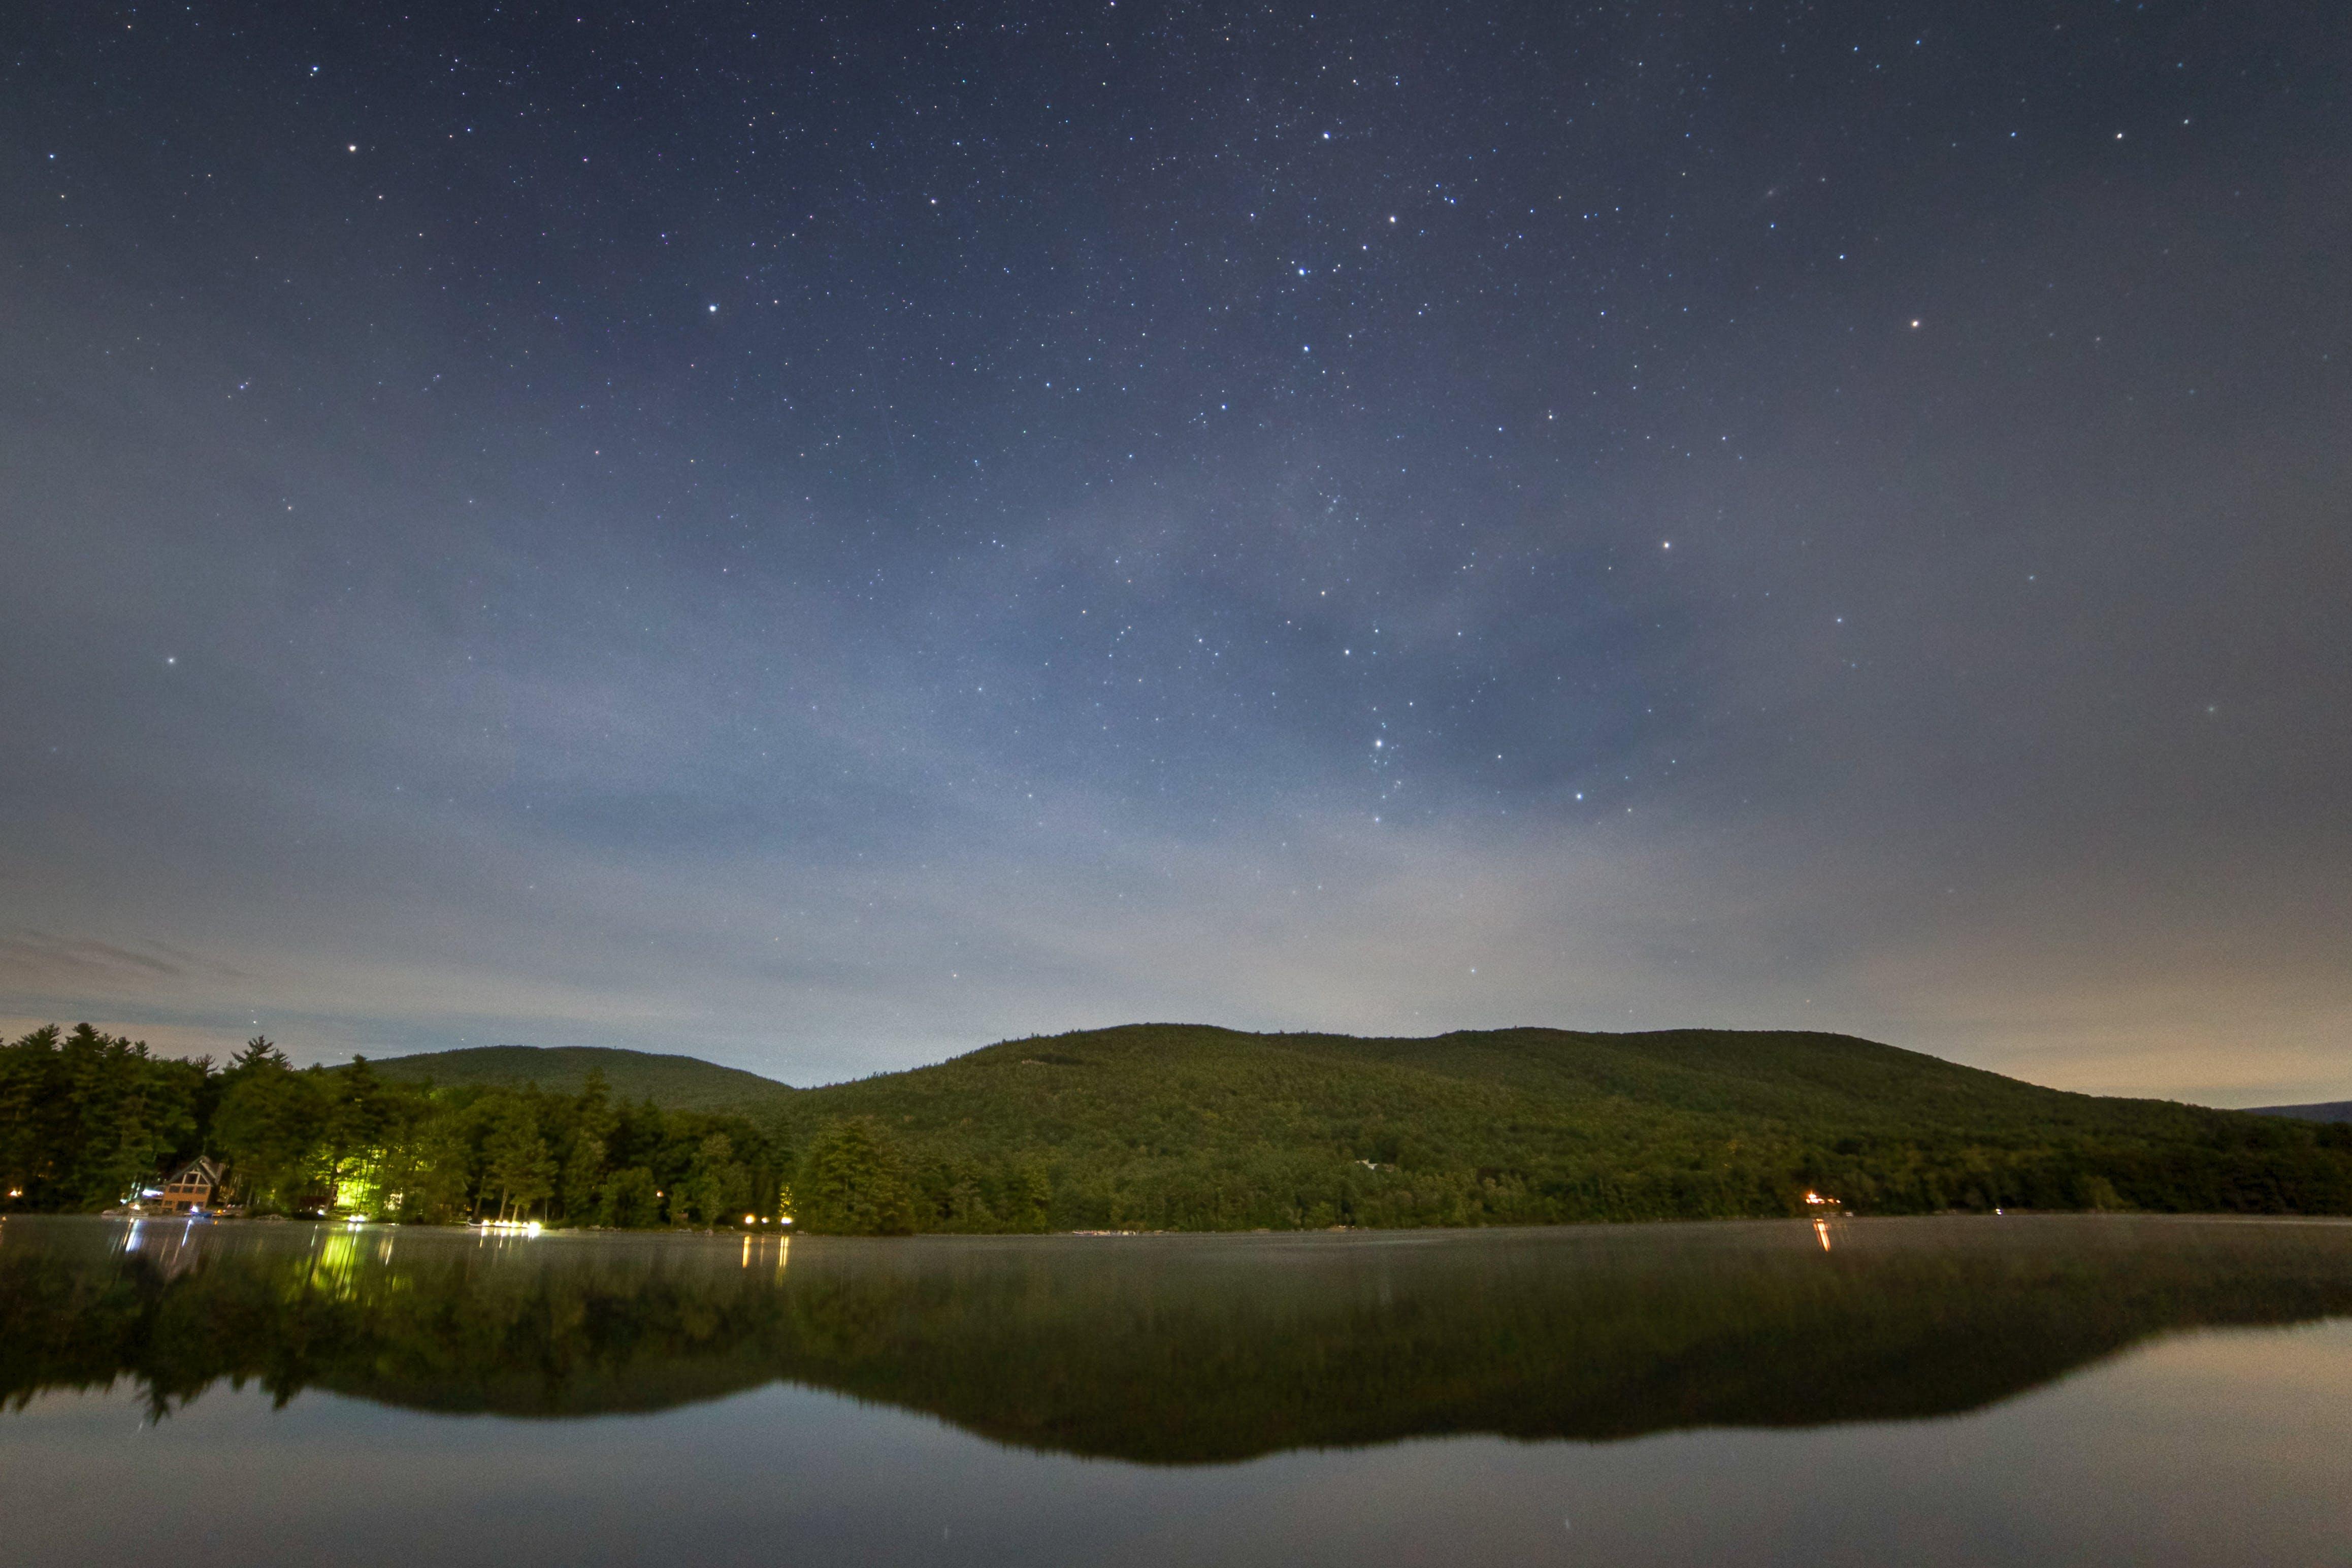 Green Mountain Near Body of Water at Night